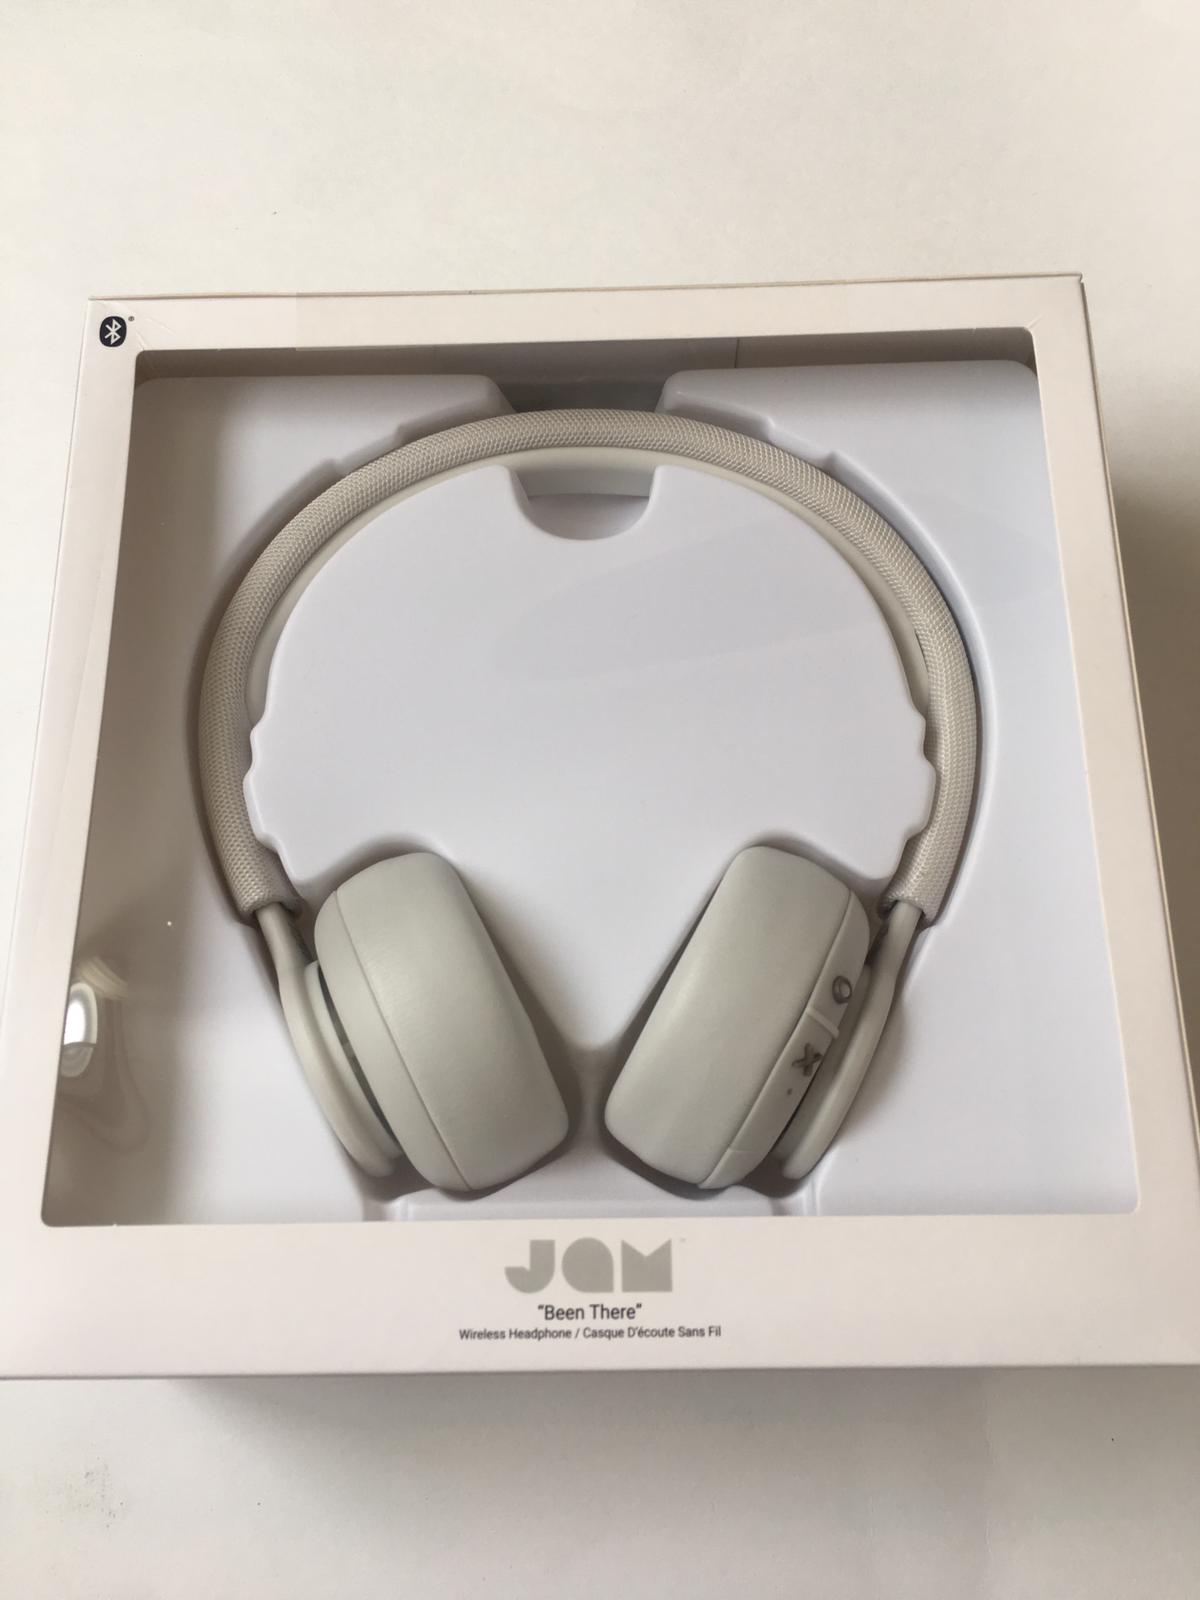 c238017ba88f 32075 - Wireless white headphones USA